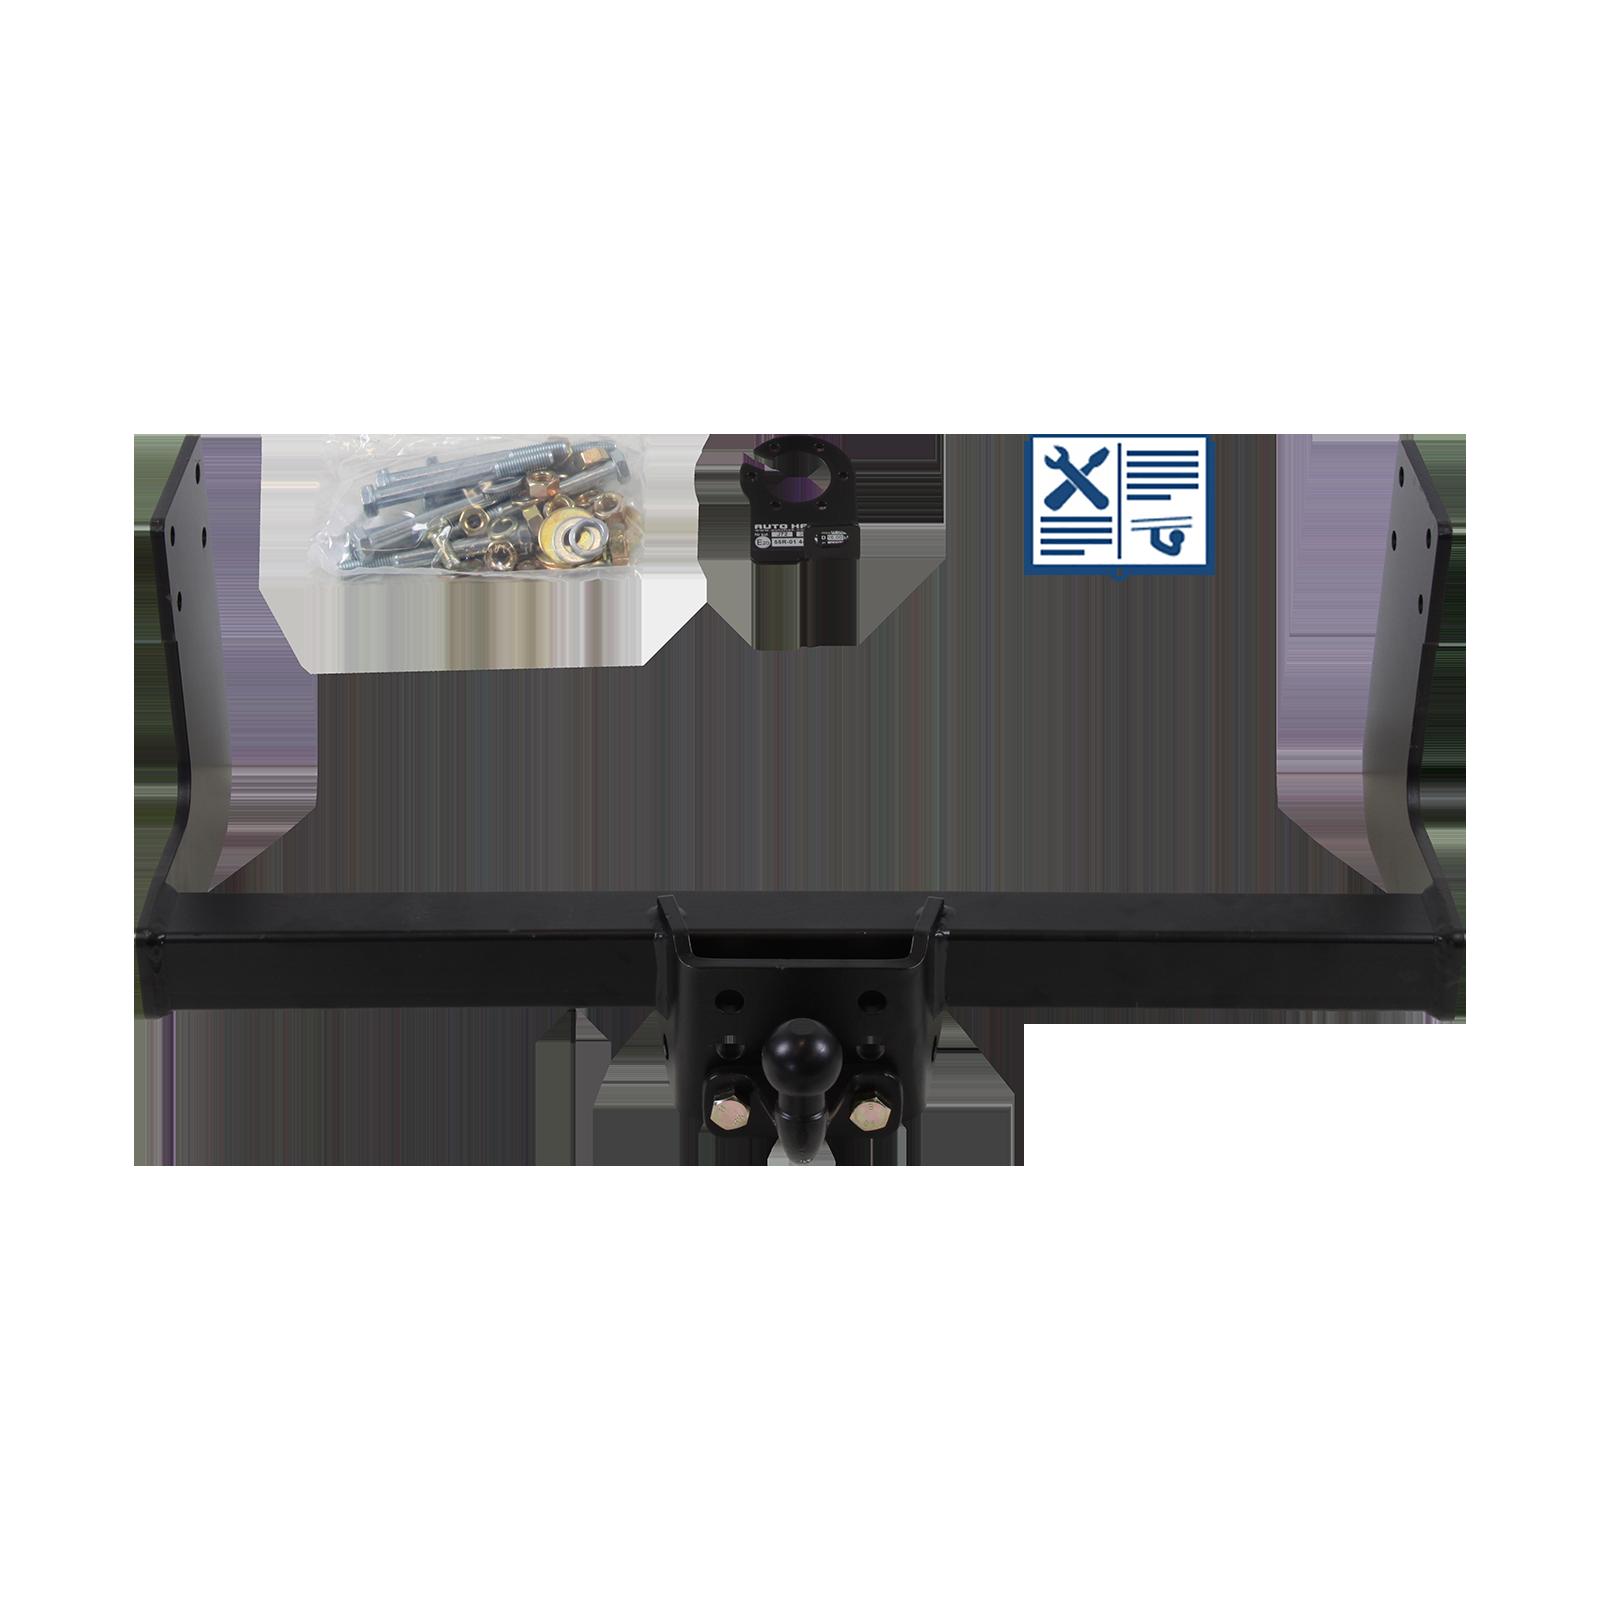 AUTO HAK Anhängebock inkl. E Satz 13polig spezifisch Adapter HYUNDAI H350 Kasten